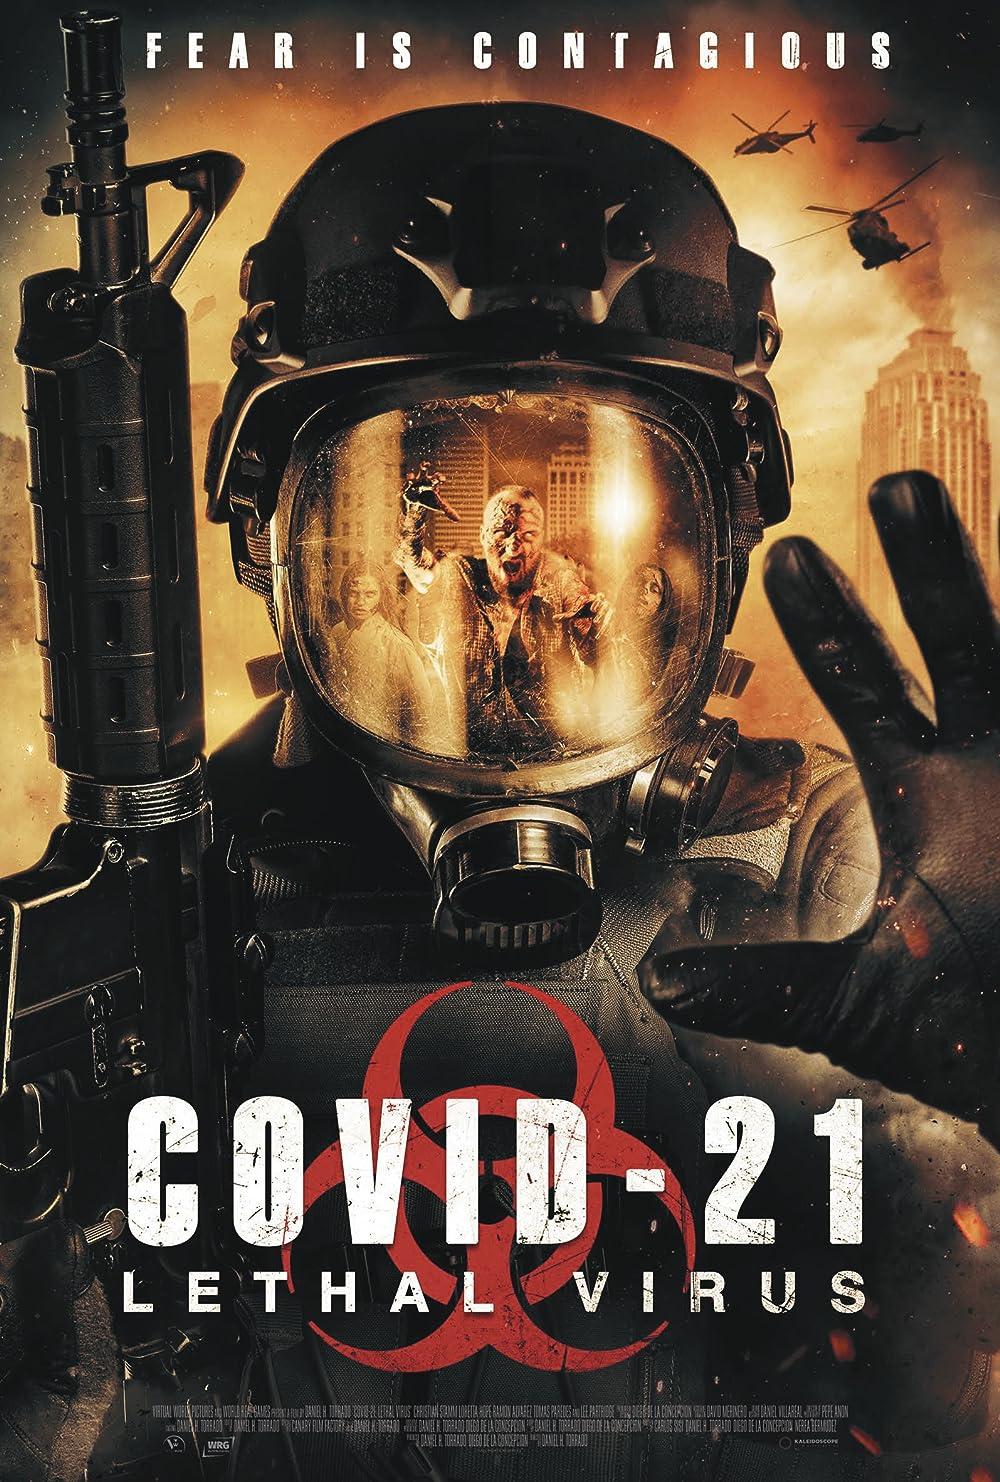 COVID-21 Lethal Virus 2021 English 270MB HDRip Download